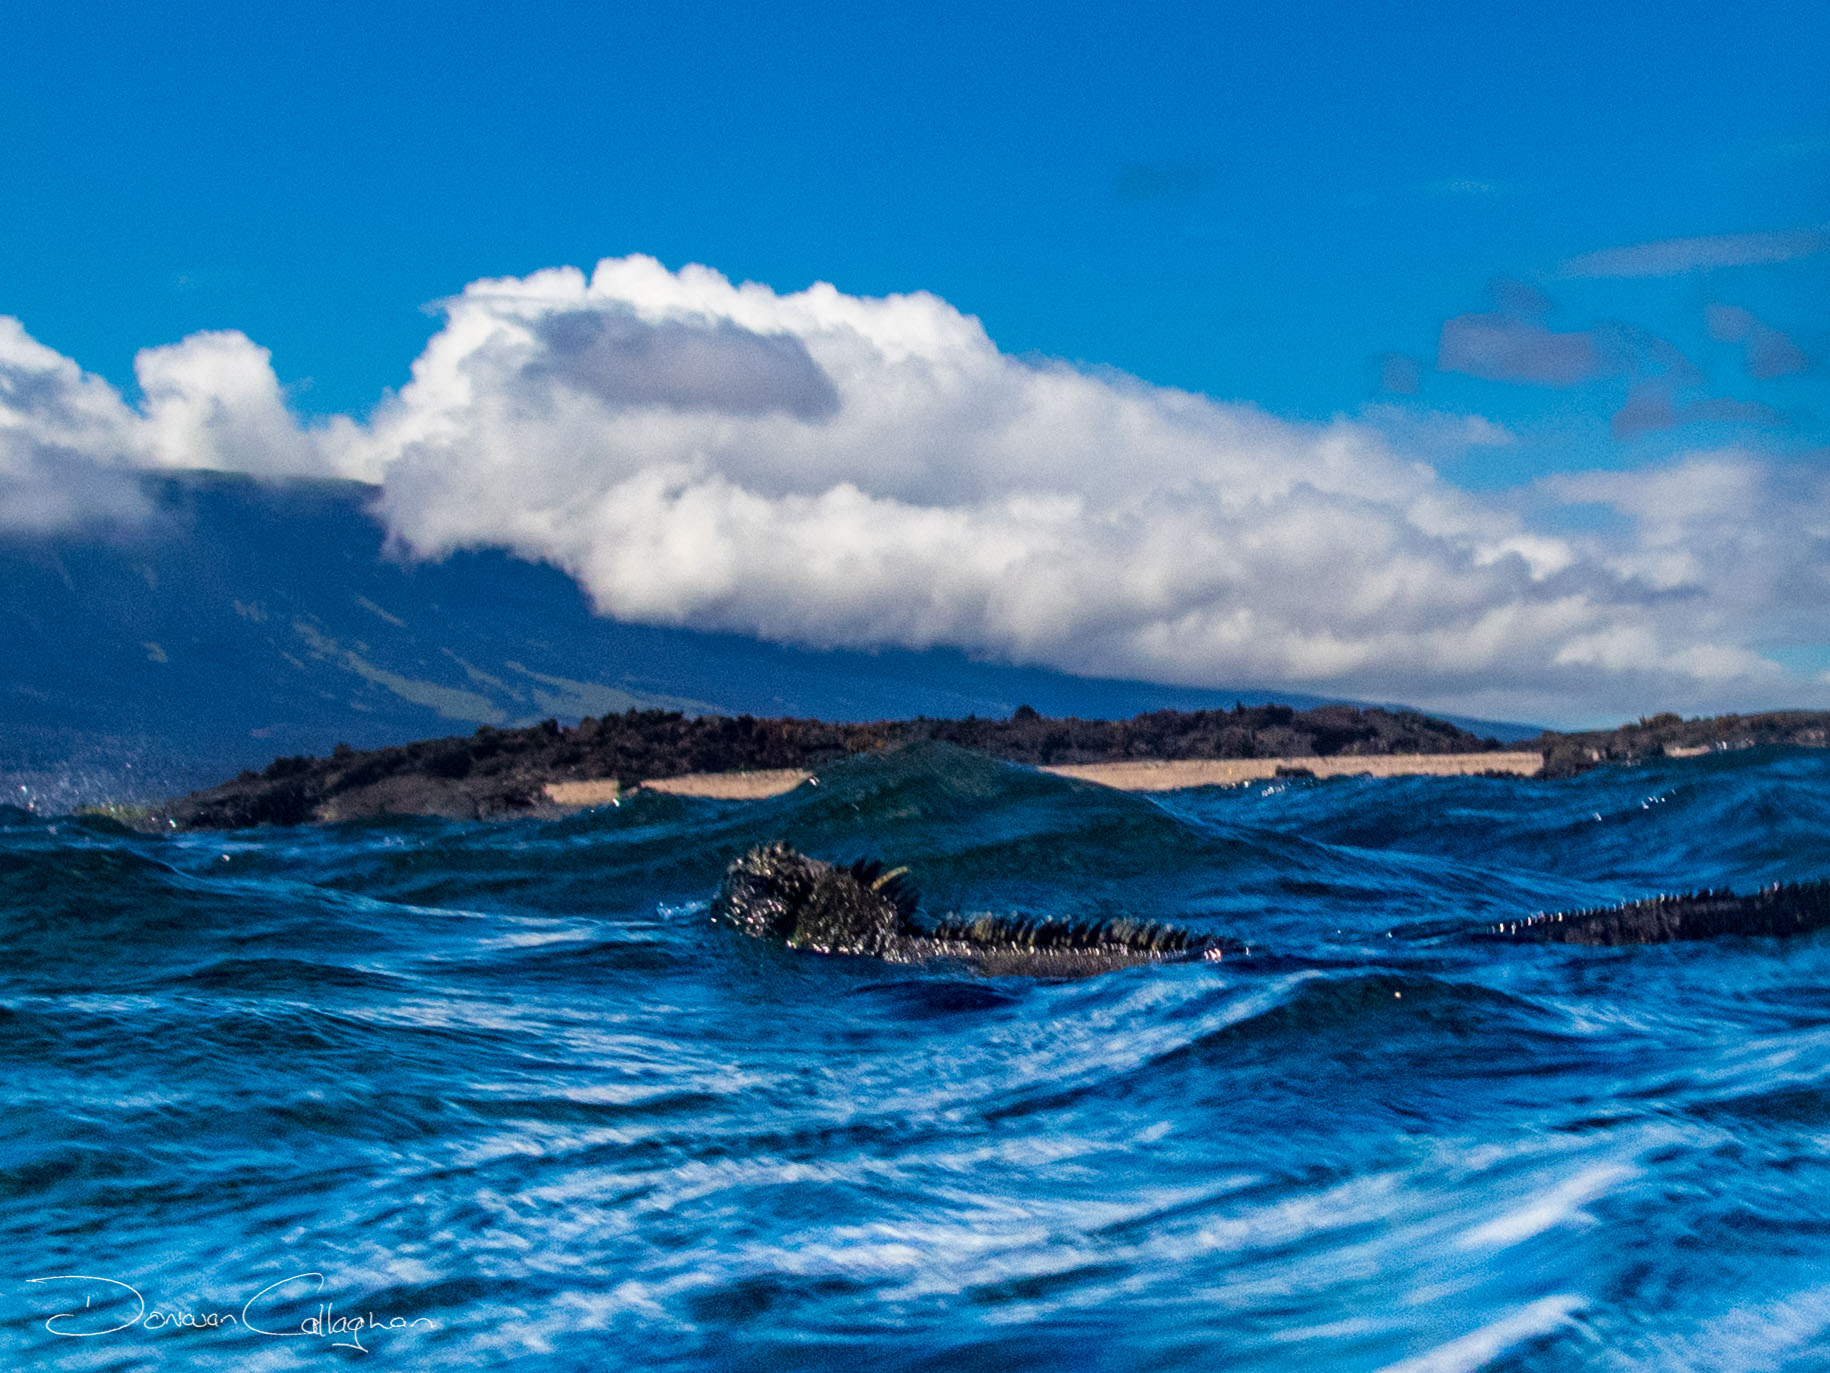 Marine iguana swimming Galapagos Islands, Ecuador